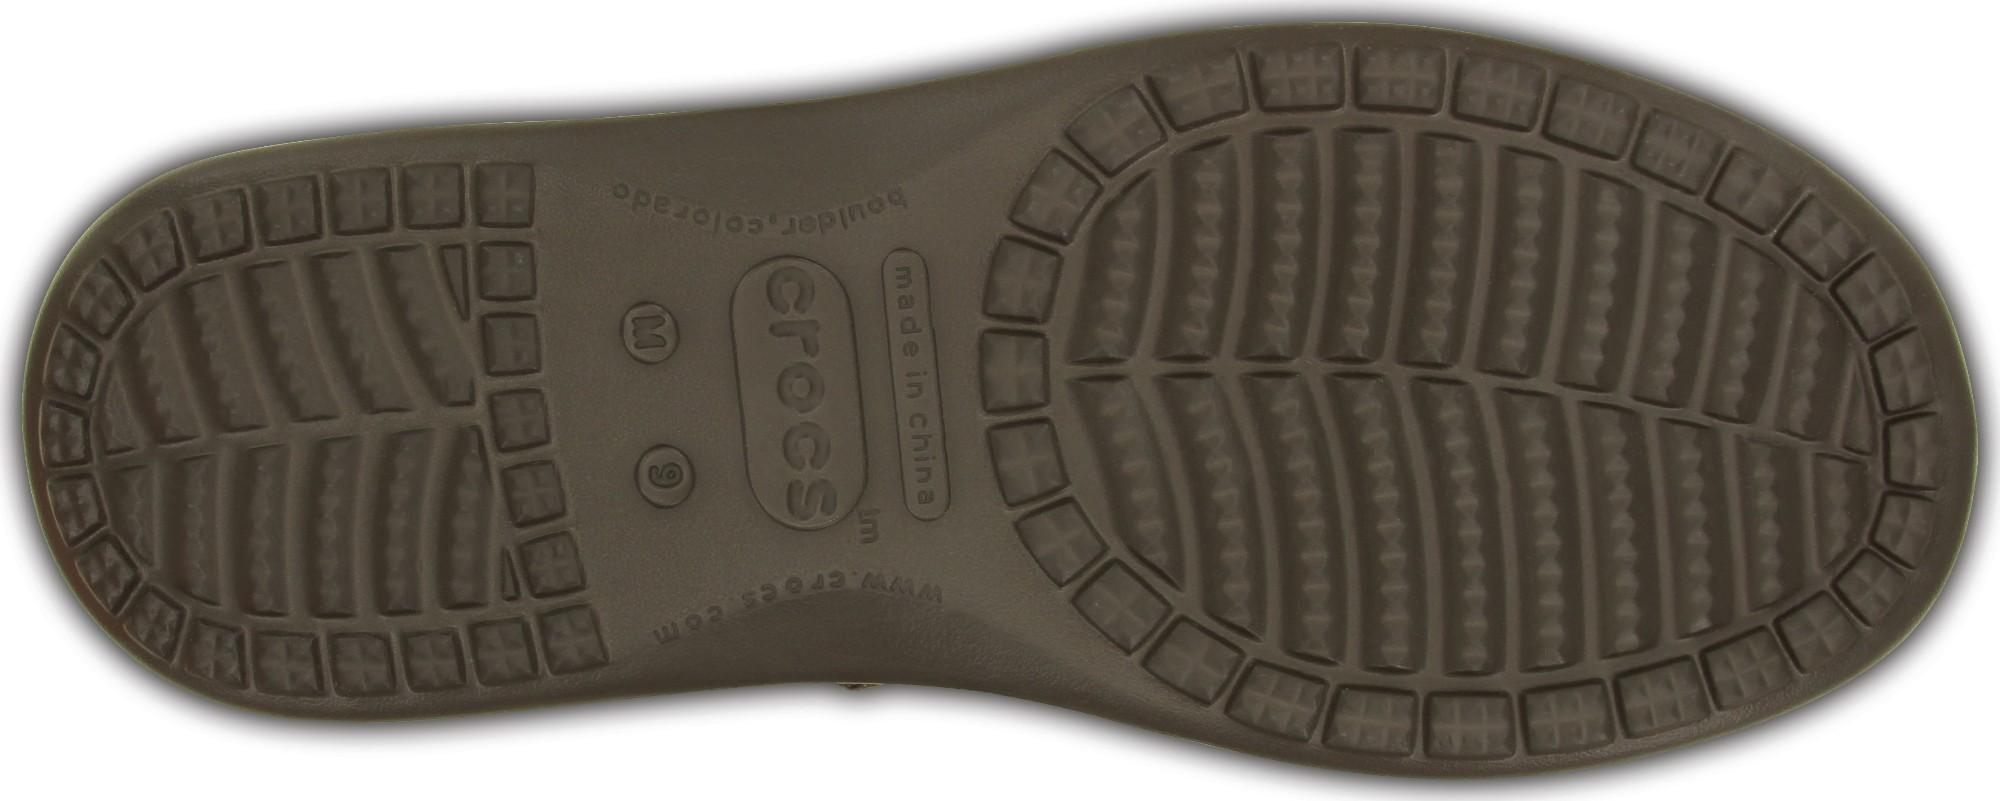 2effcca1a11 Previous. Crocs™ Santa Cruz Clean Cut Loafer Espresso Espresso ...